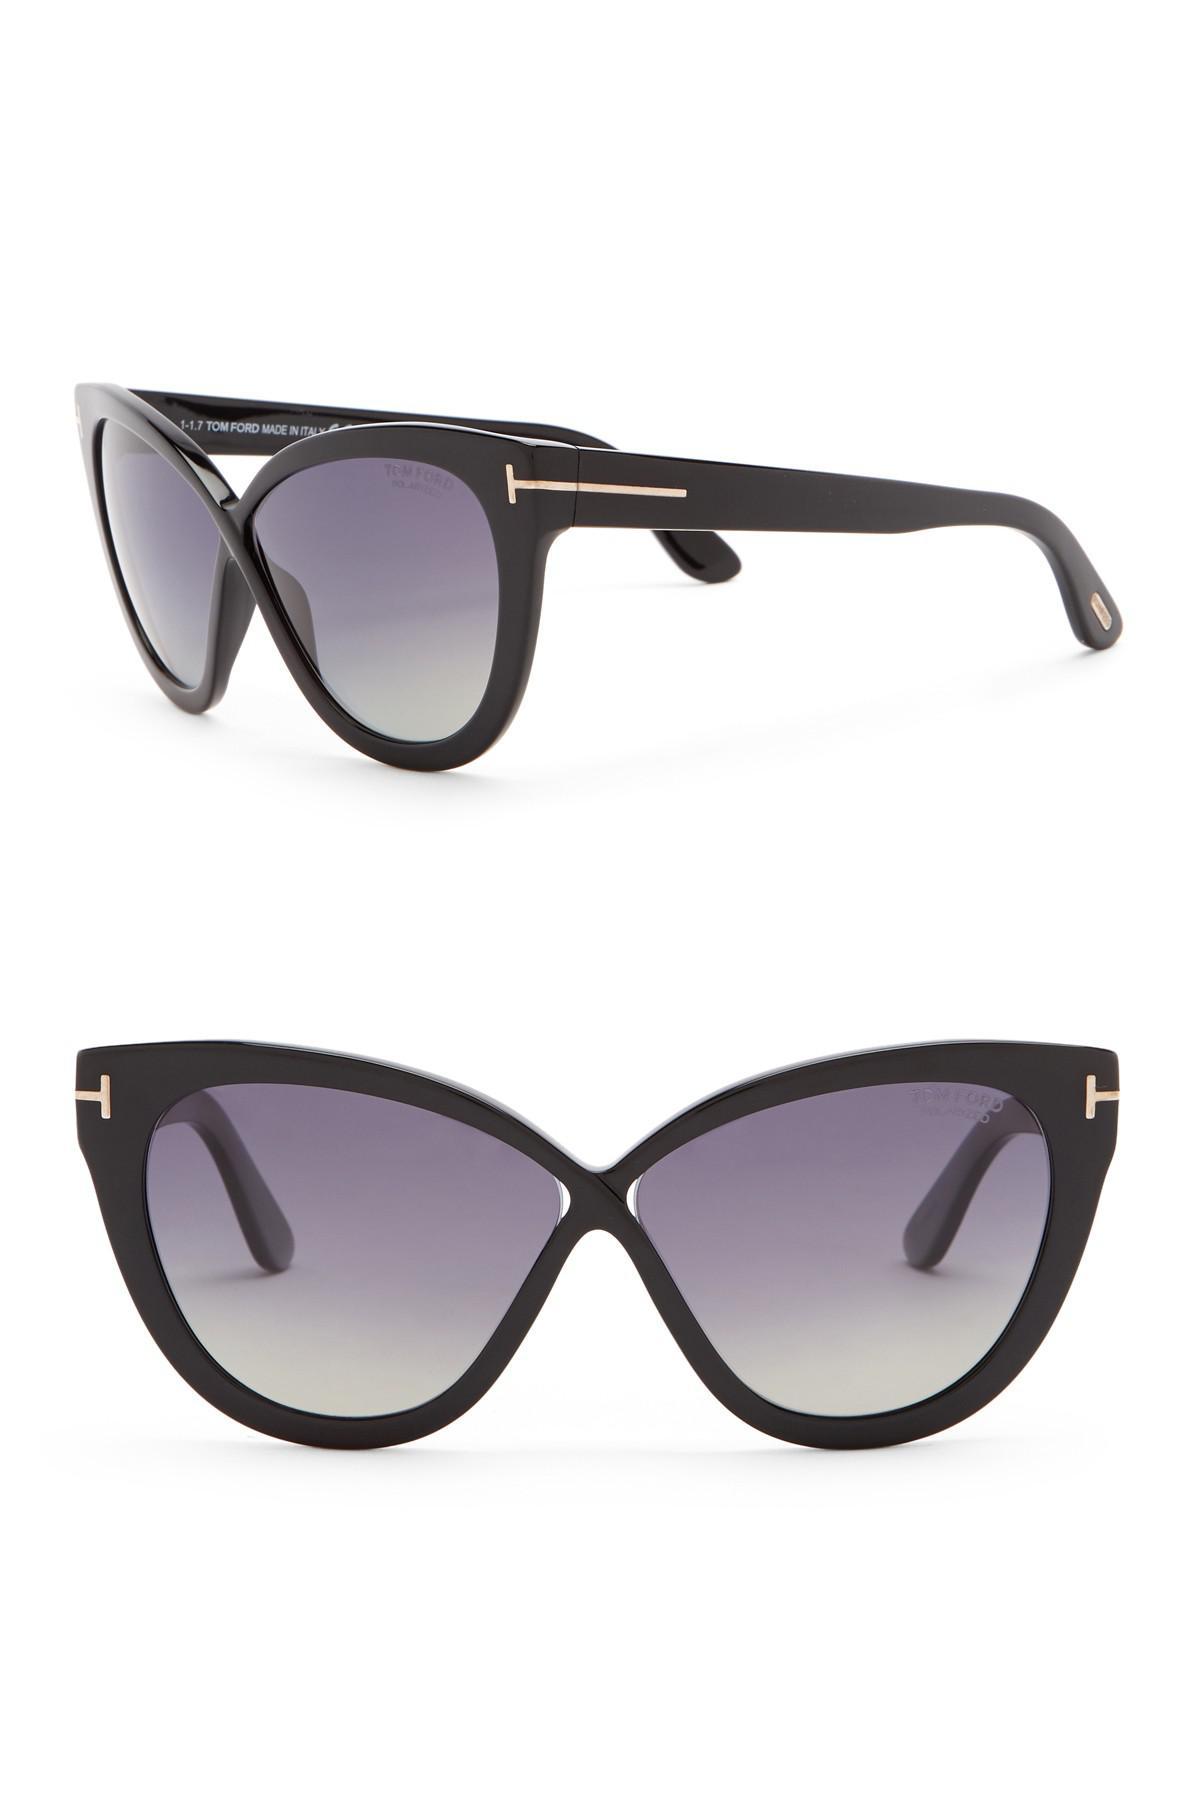 427162e1e0a59 Lyst - Tom Ford Arabella 59mm Cat Eye Sunglasses